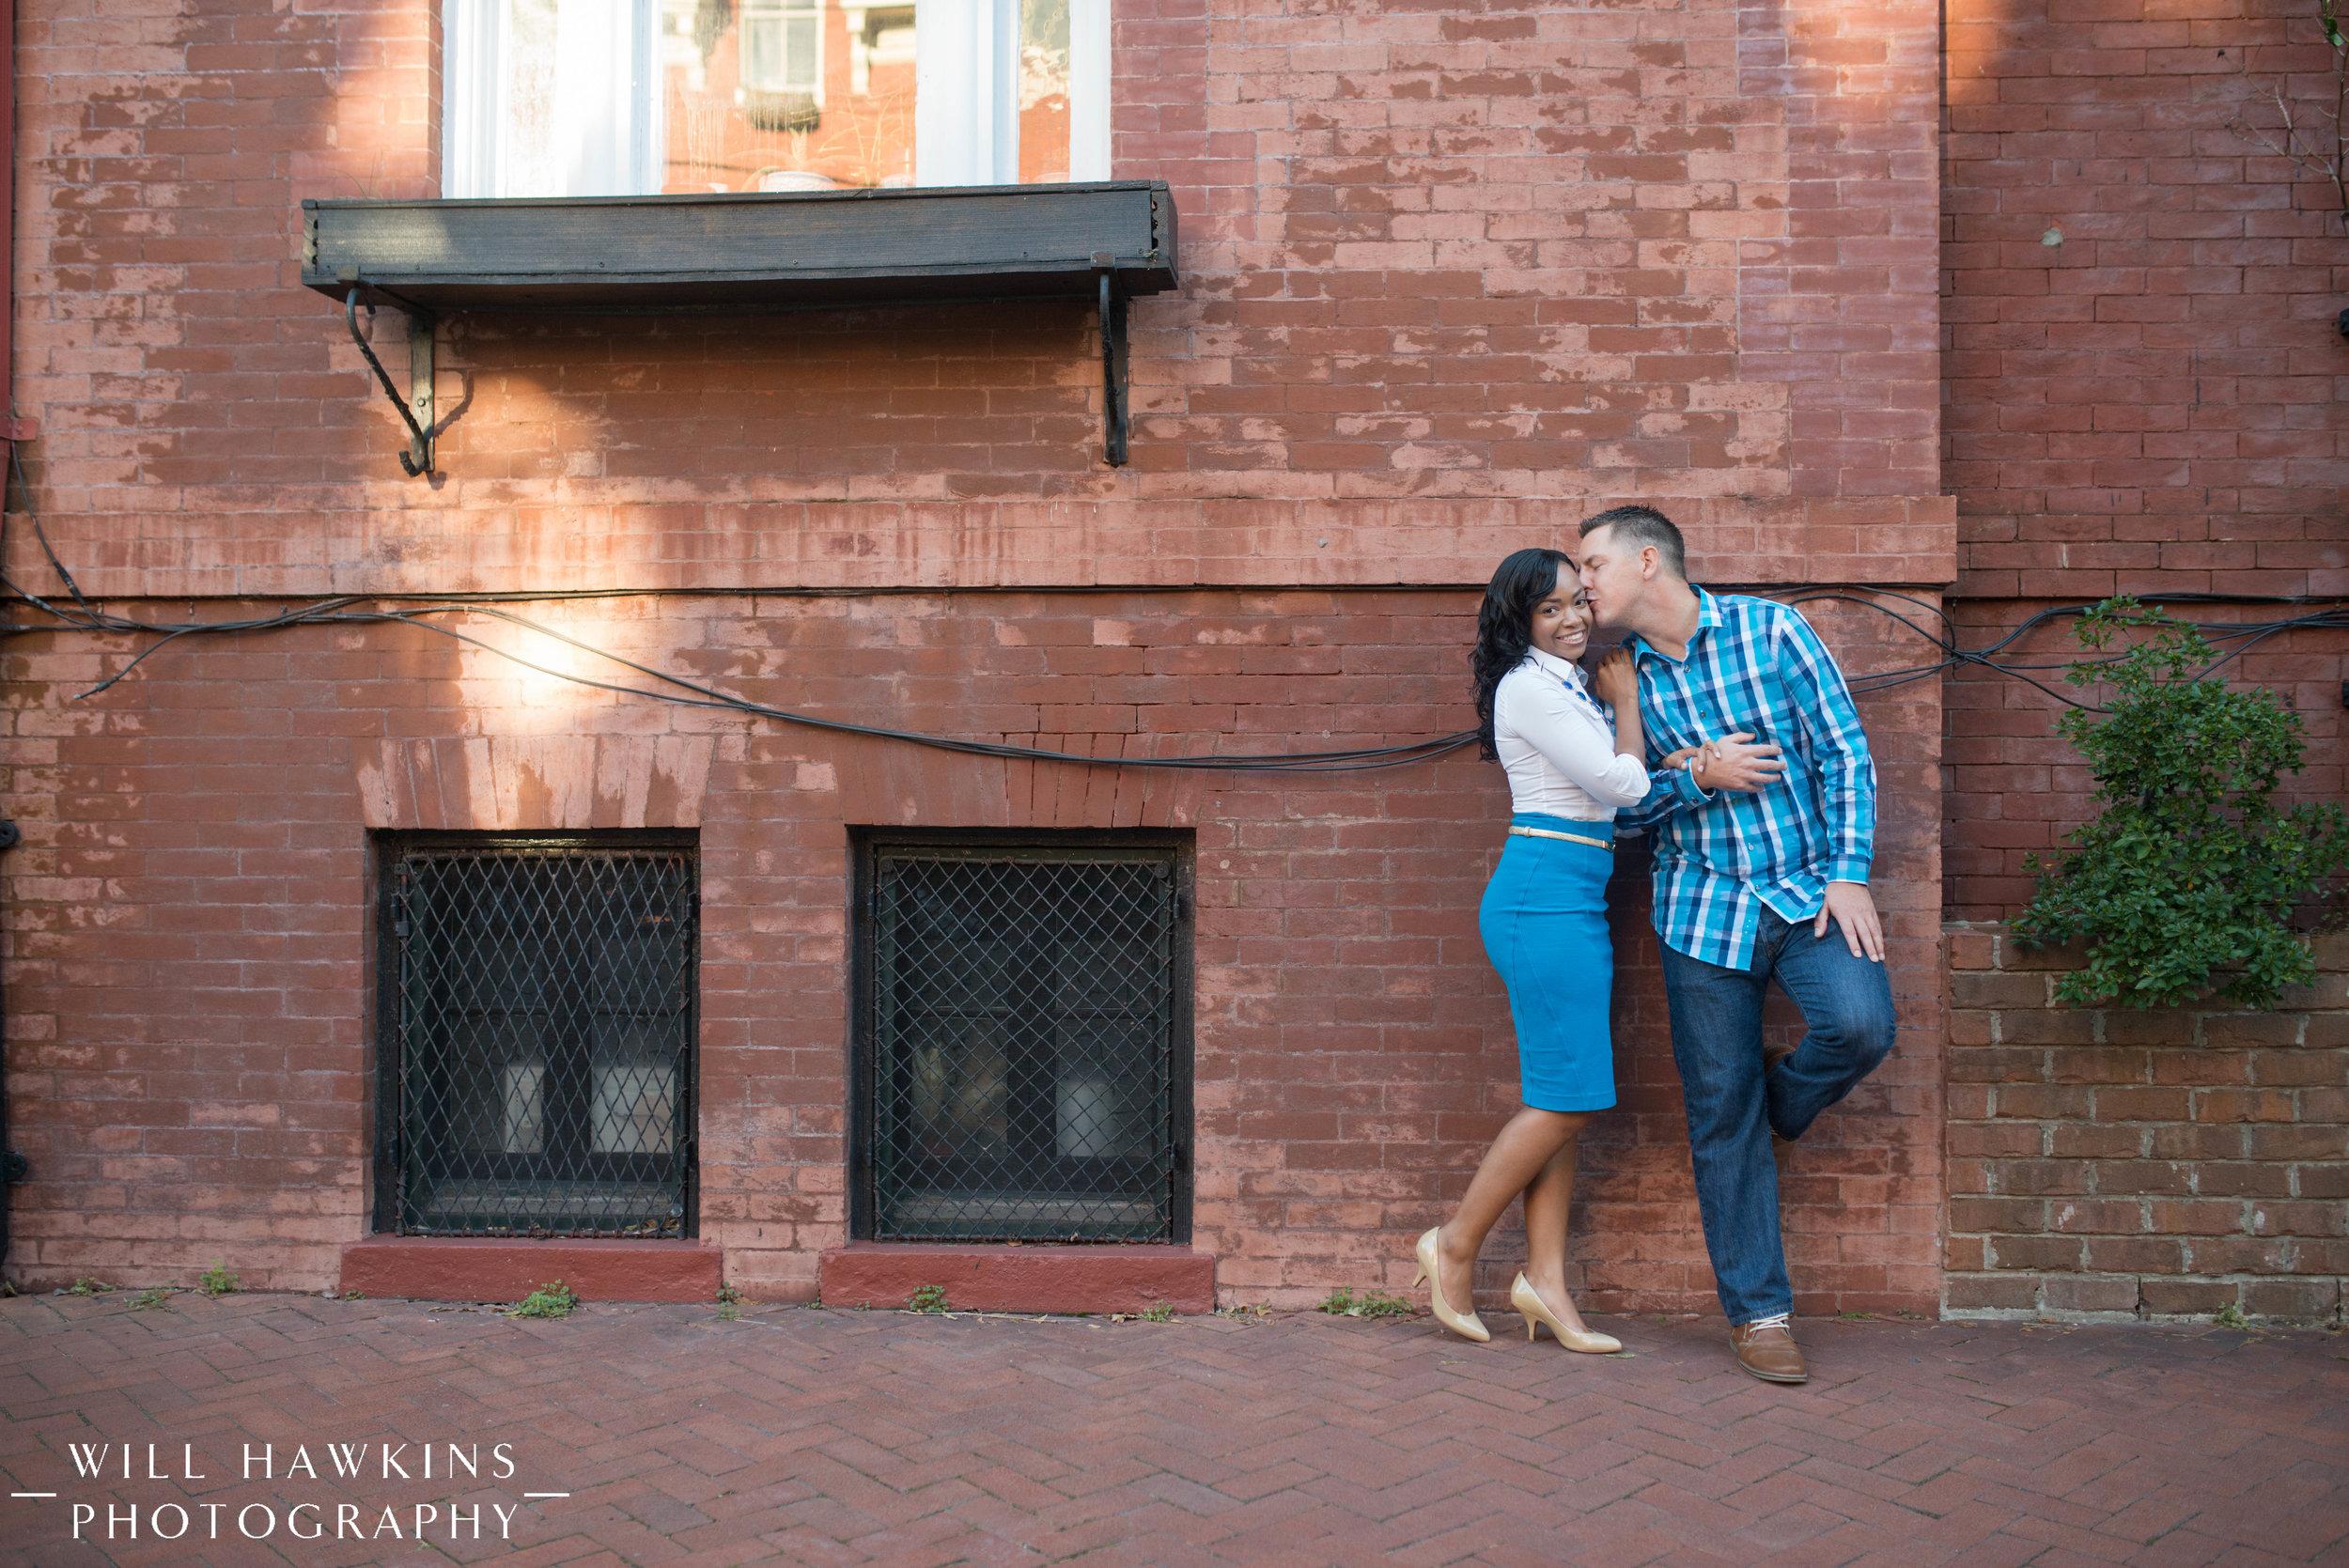 Will Hawkins Photography, Virginia Wedding Photographer, Virginia Beach Wedding Phootgrapher, Destination Wedding Photographer-2.jpg